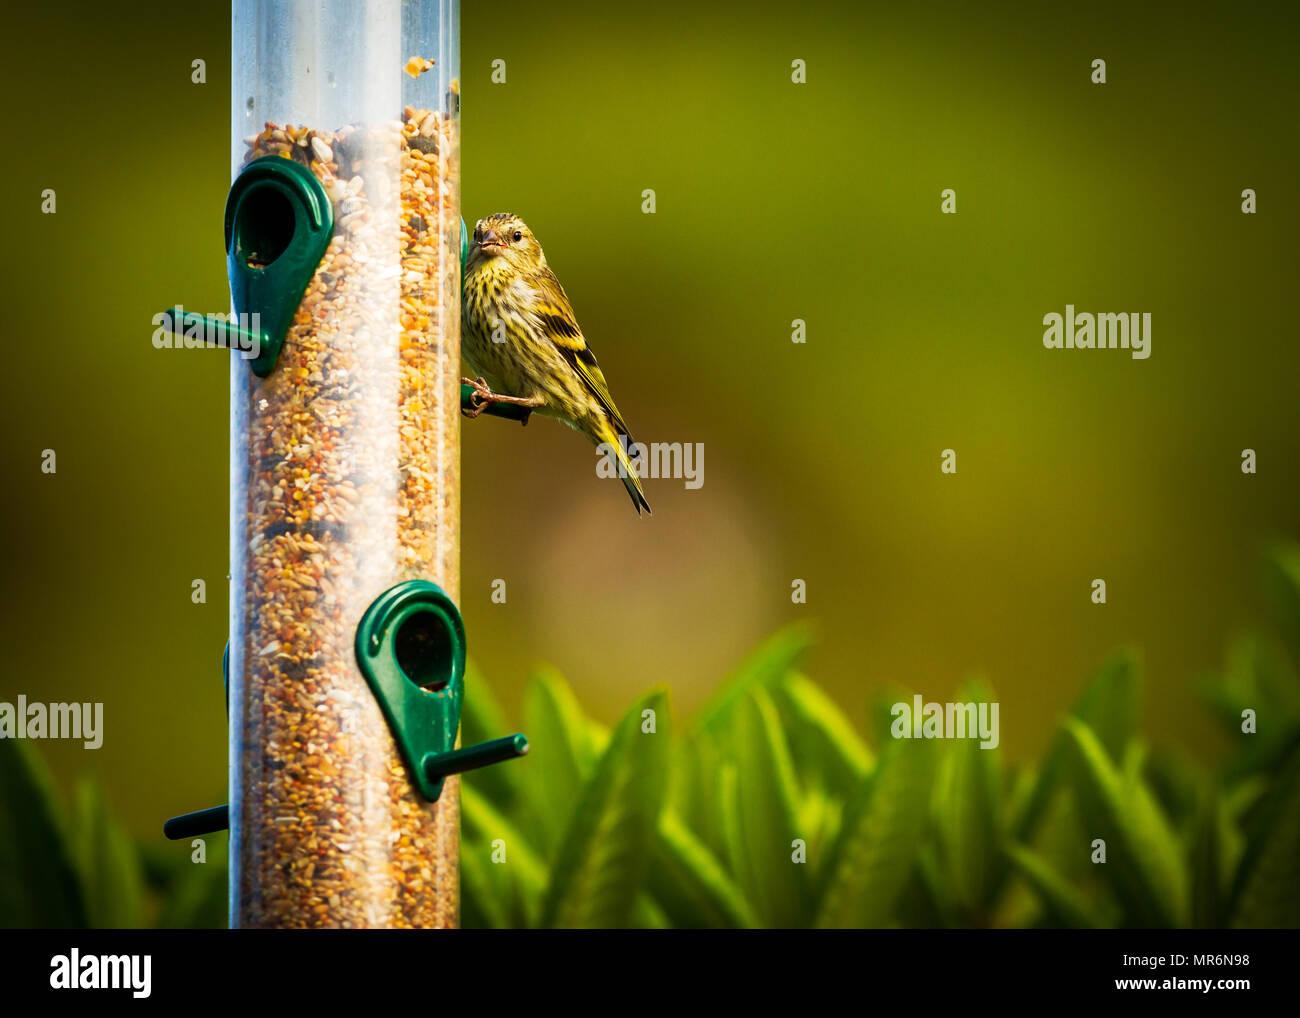 Male Siskin sitting on a bird feeder - Stock Image